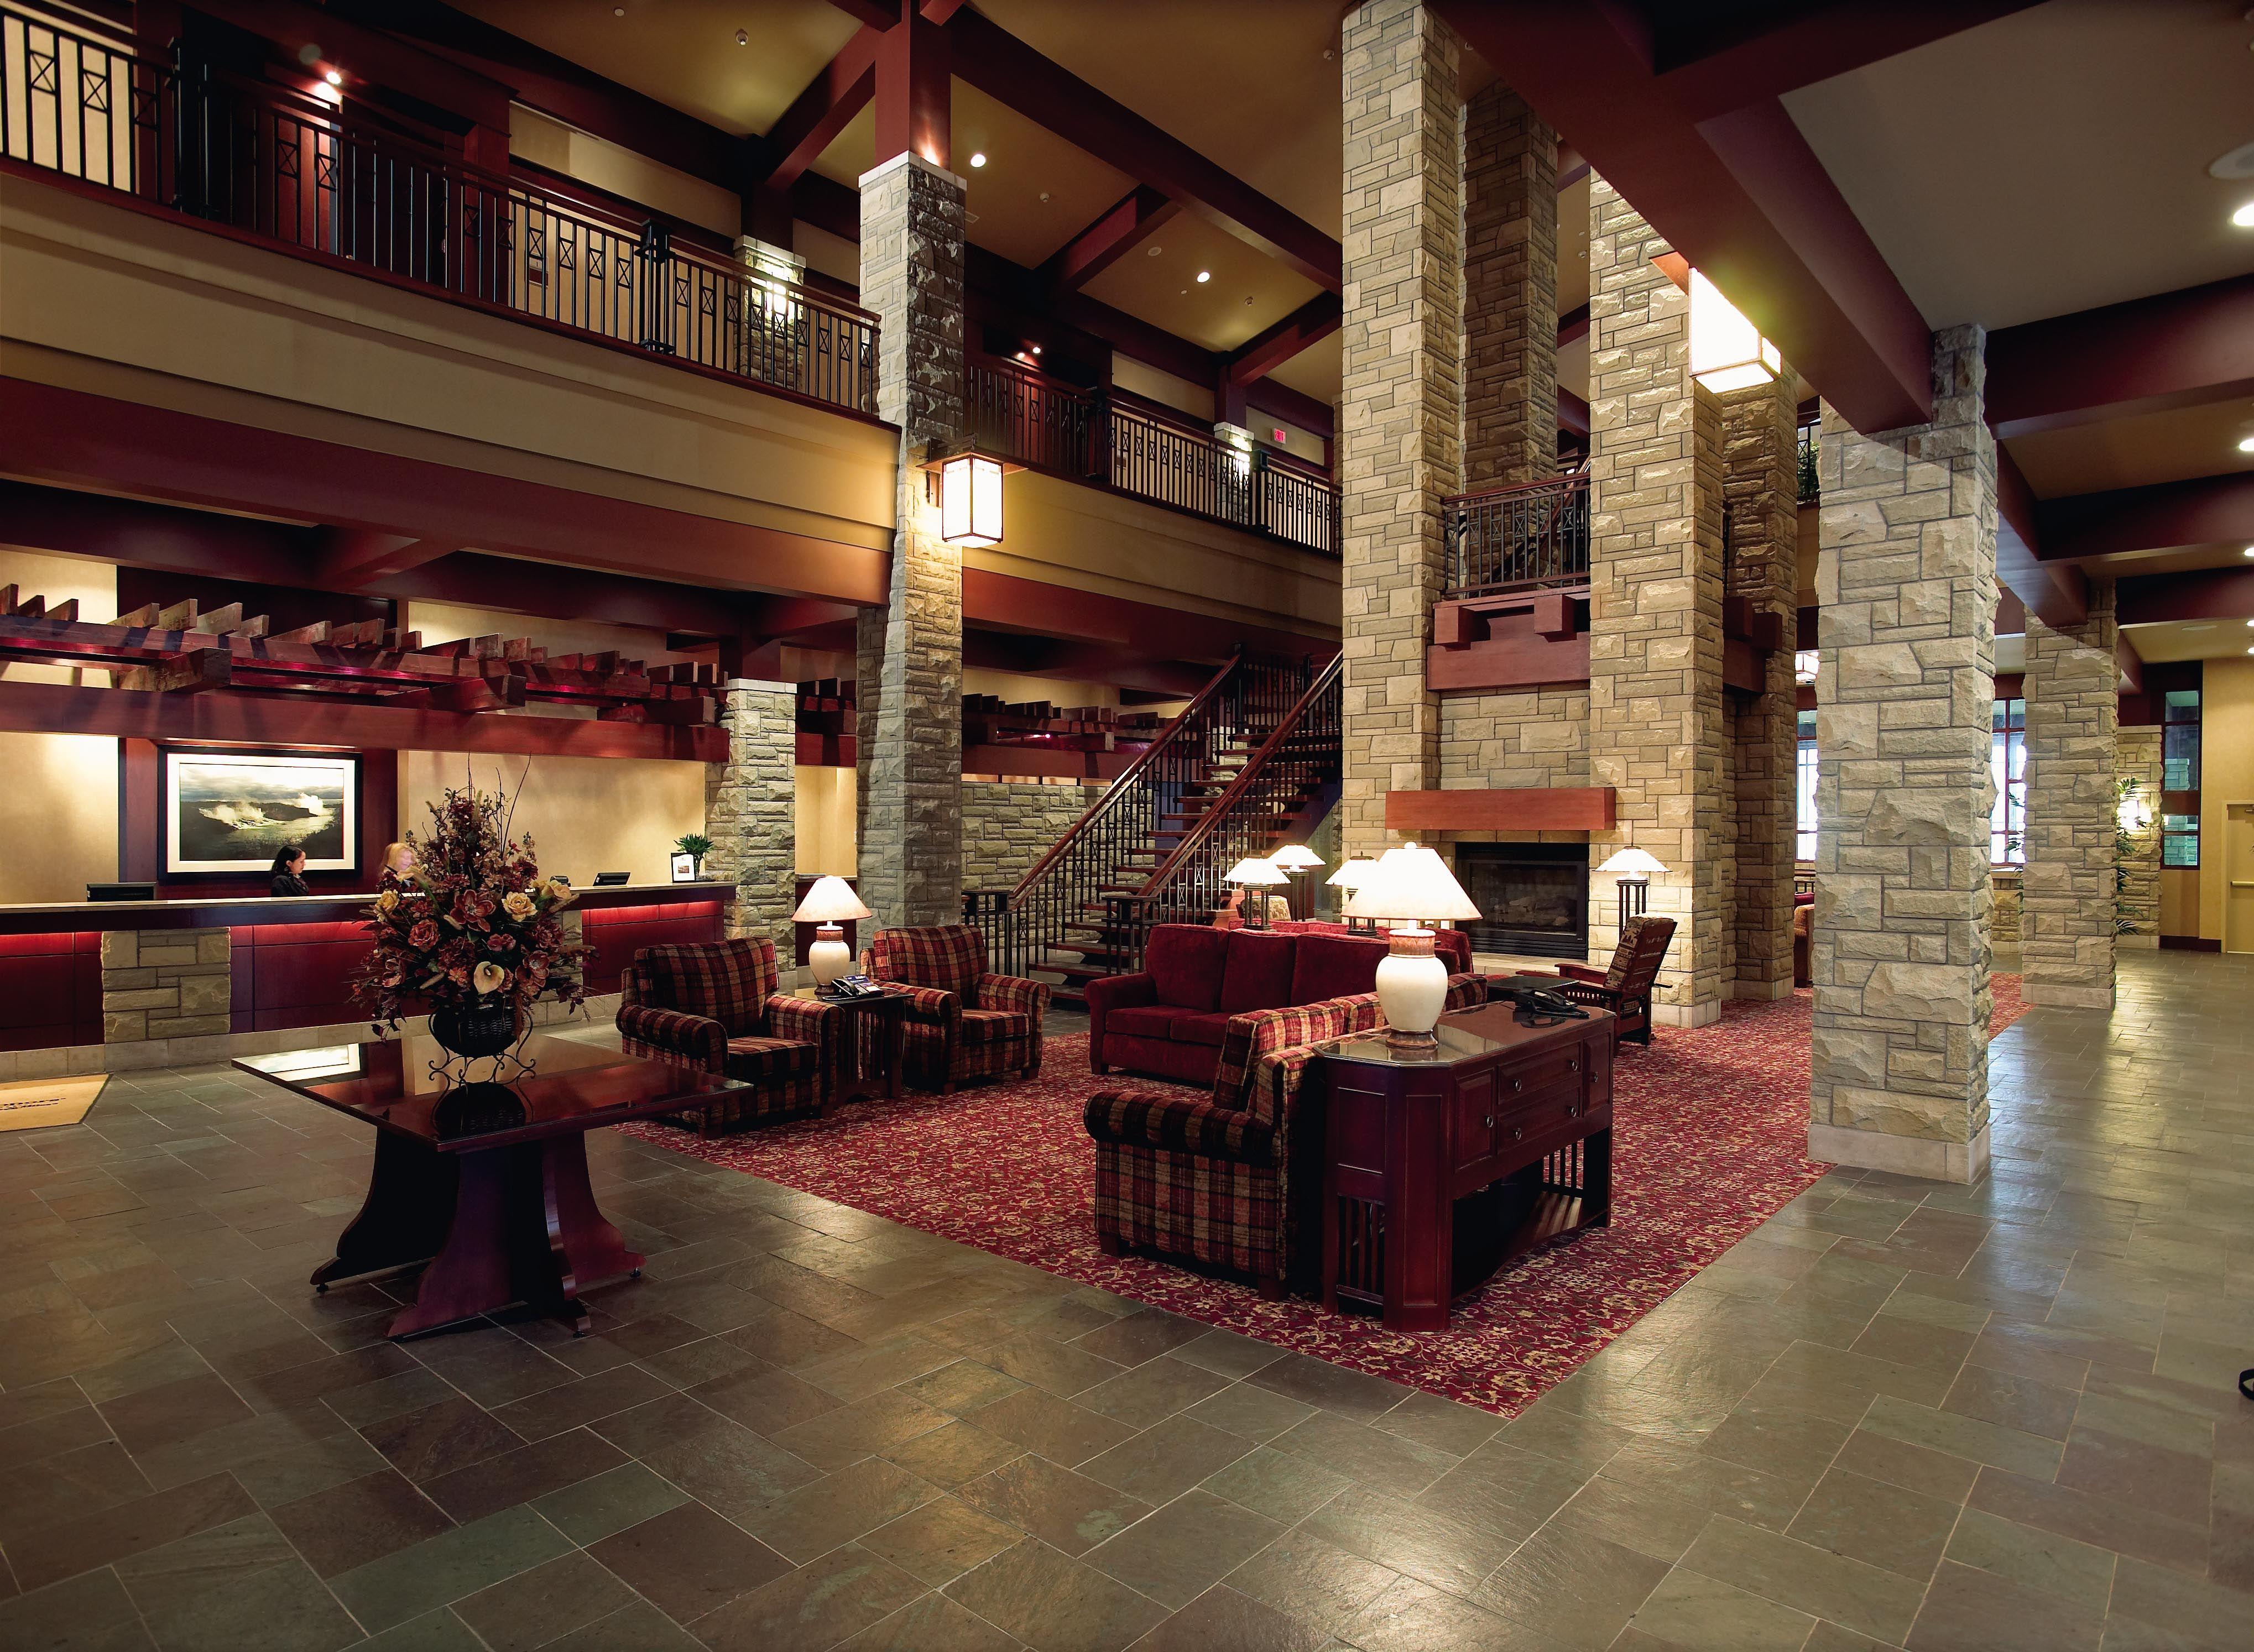 Niagara Wedding Venues Niagara Wedding Helper Wedding Directory Niagara Falls Hotels Resort Spa Hotel